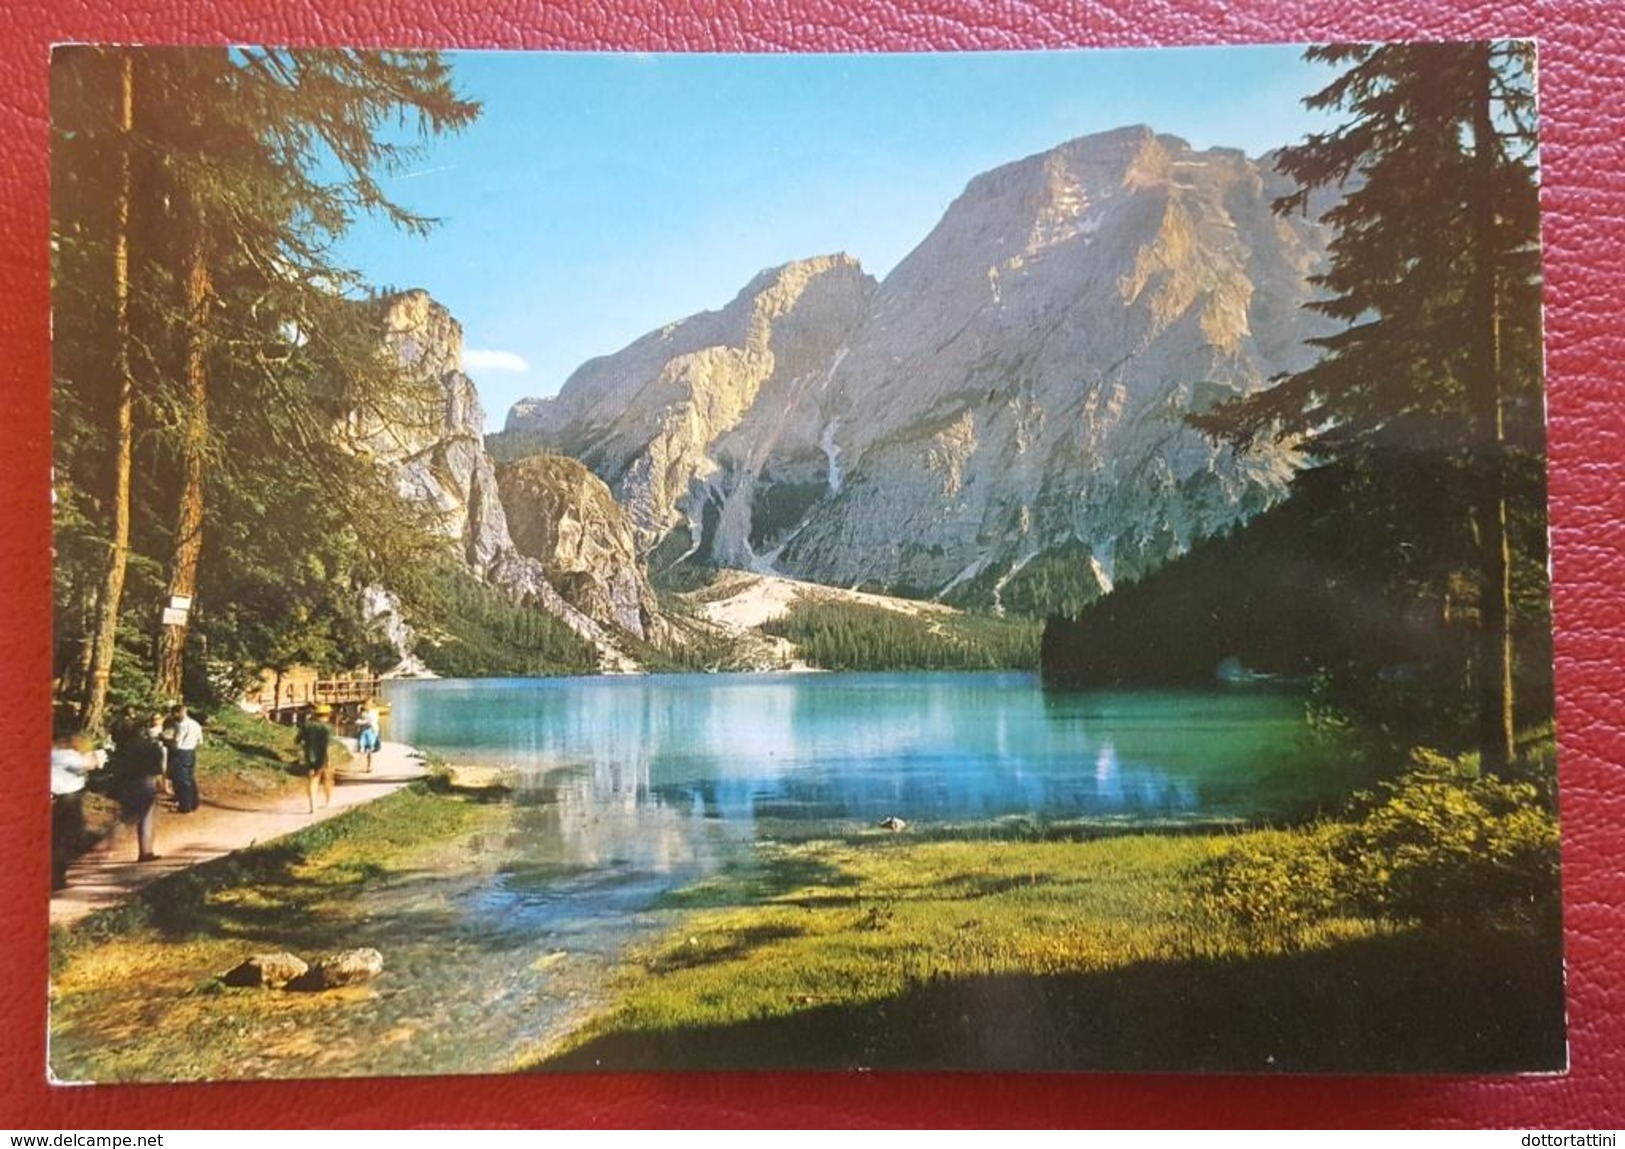 LAGO DI BRAIES - Pragser Wildsee - Braies (Bolzano) - Dolomiti Vg - Bolzano